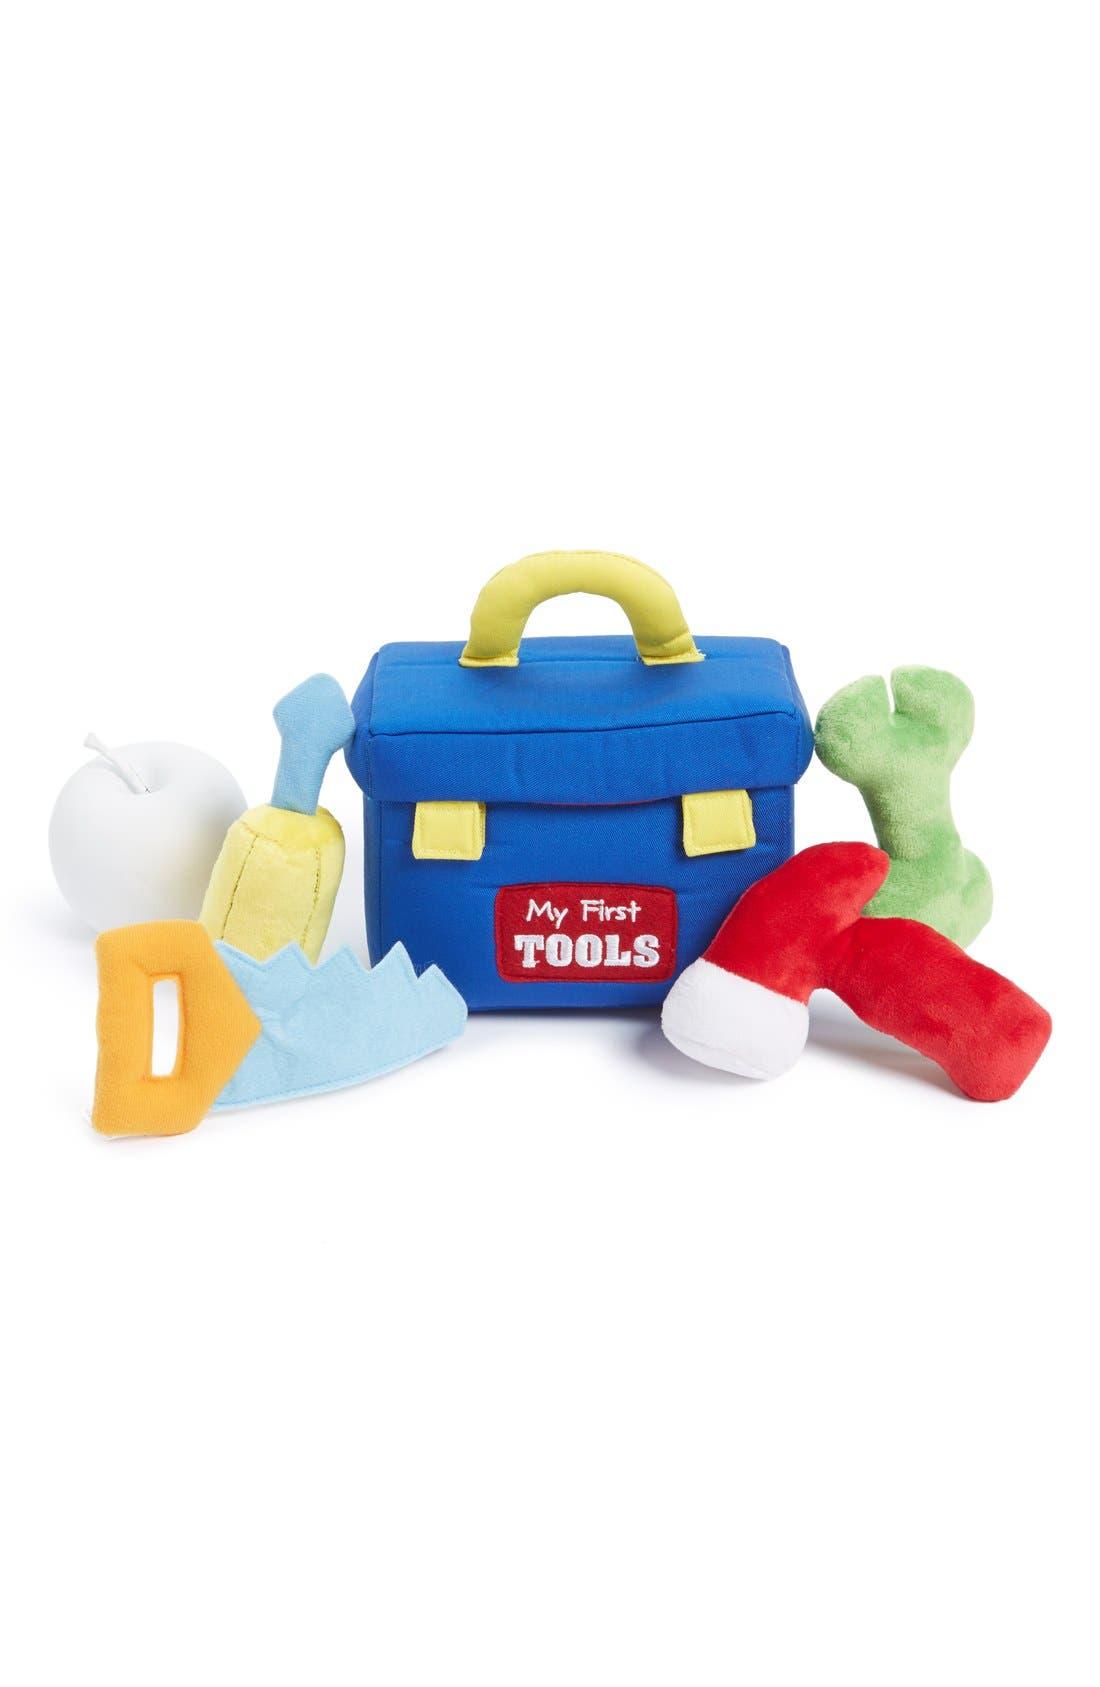 Gund 'My First Toolbox' Plush Play Set